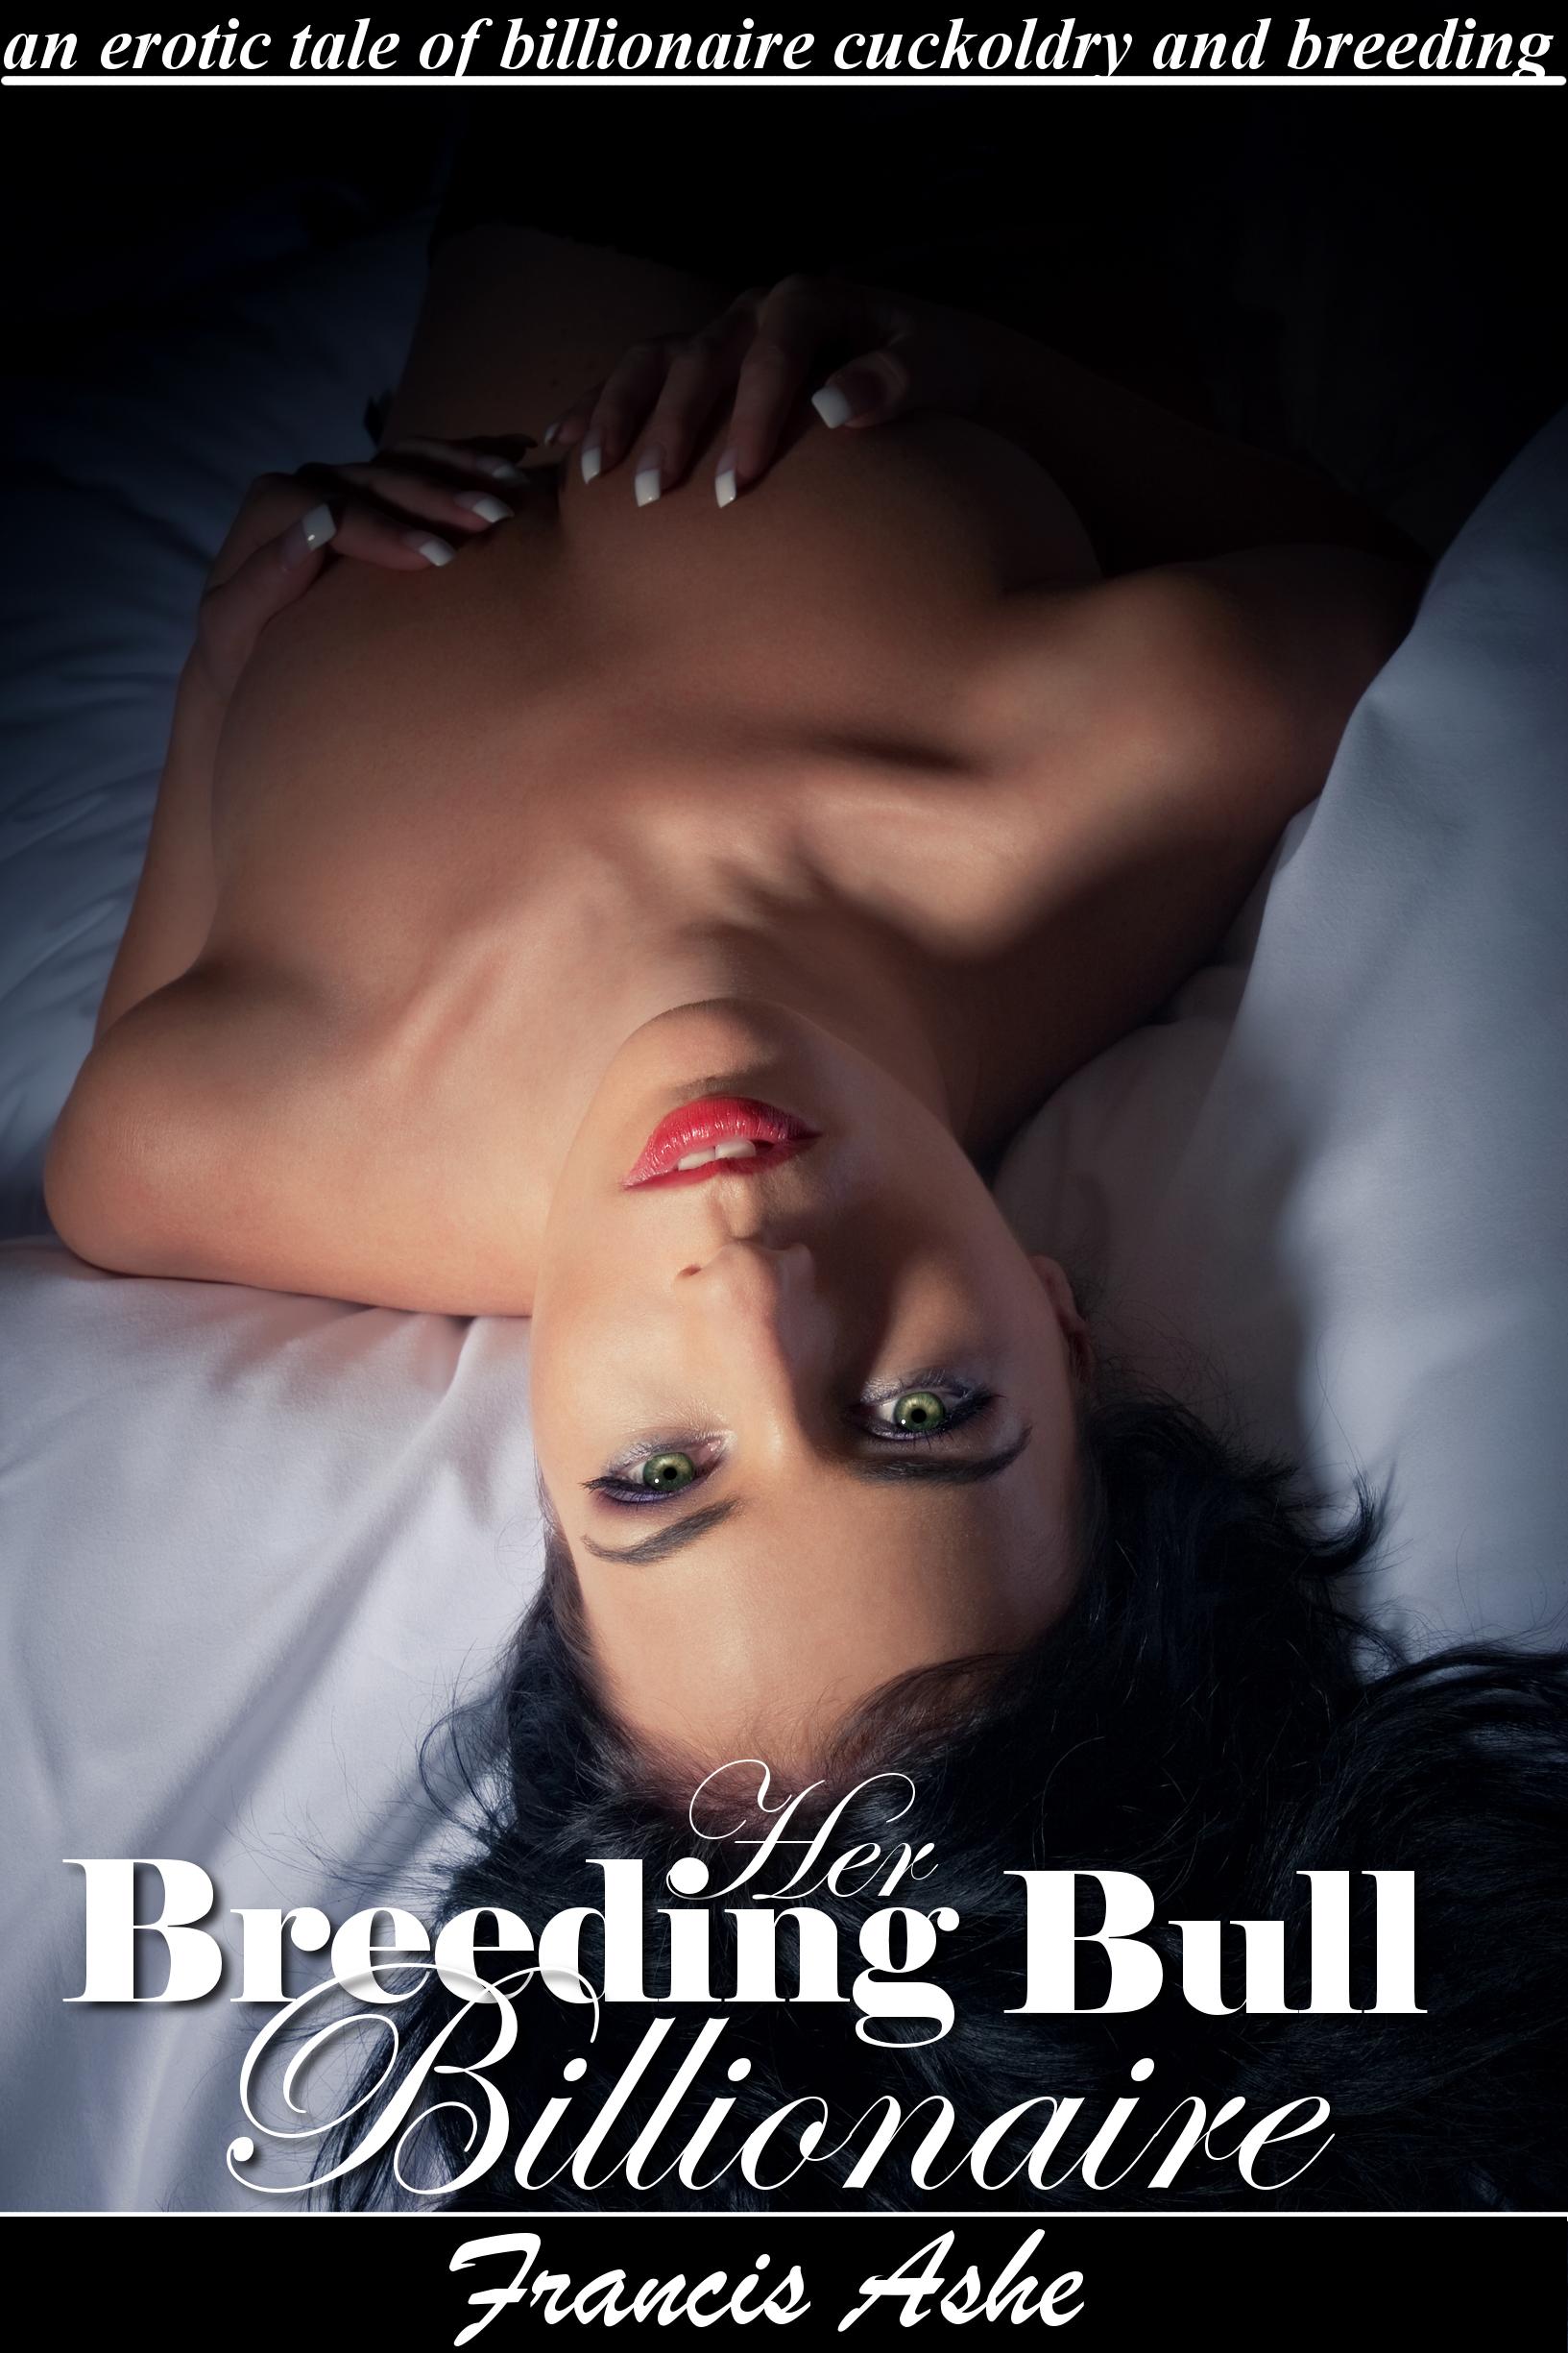 Francis Ashe - Her Breeding Bull Billionaire (billionaire cuckoldry, impregnation and domination erotica)